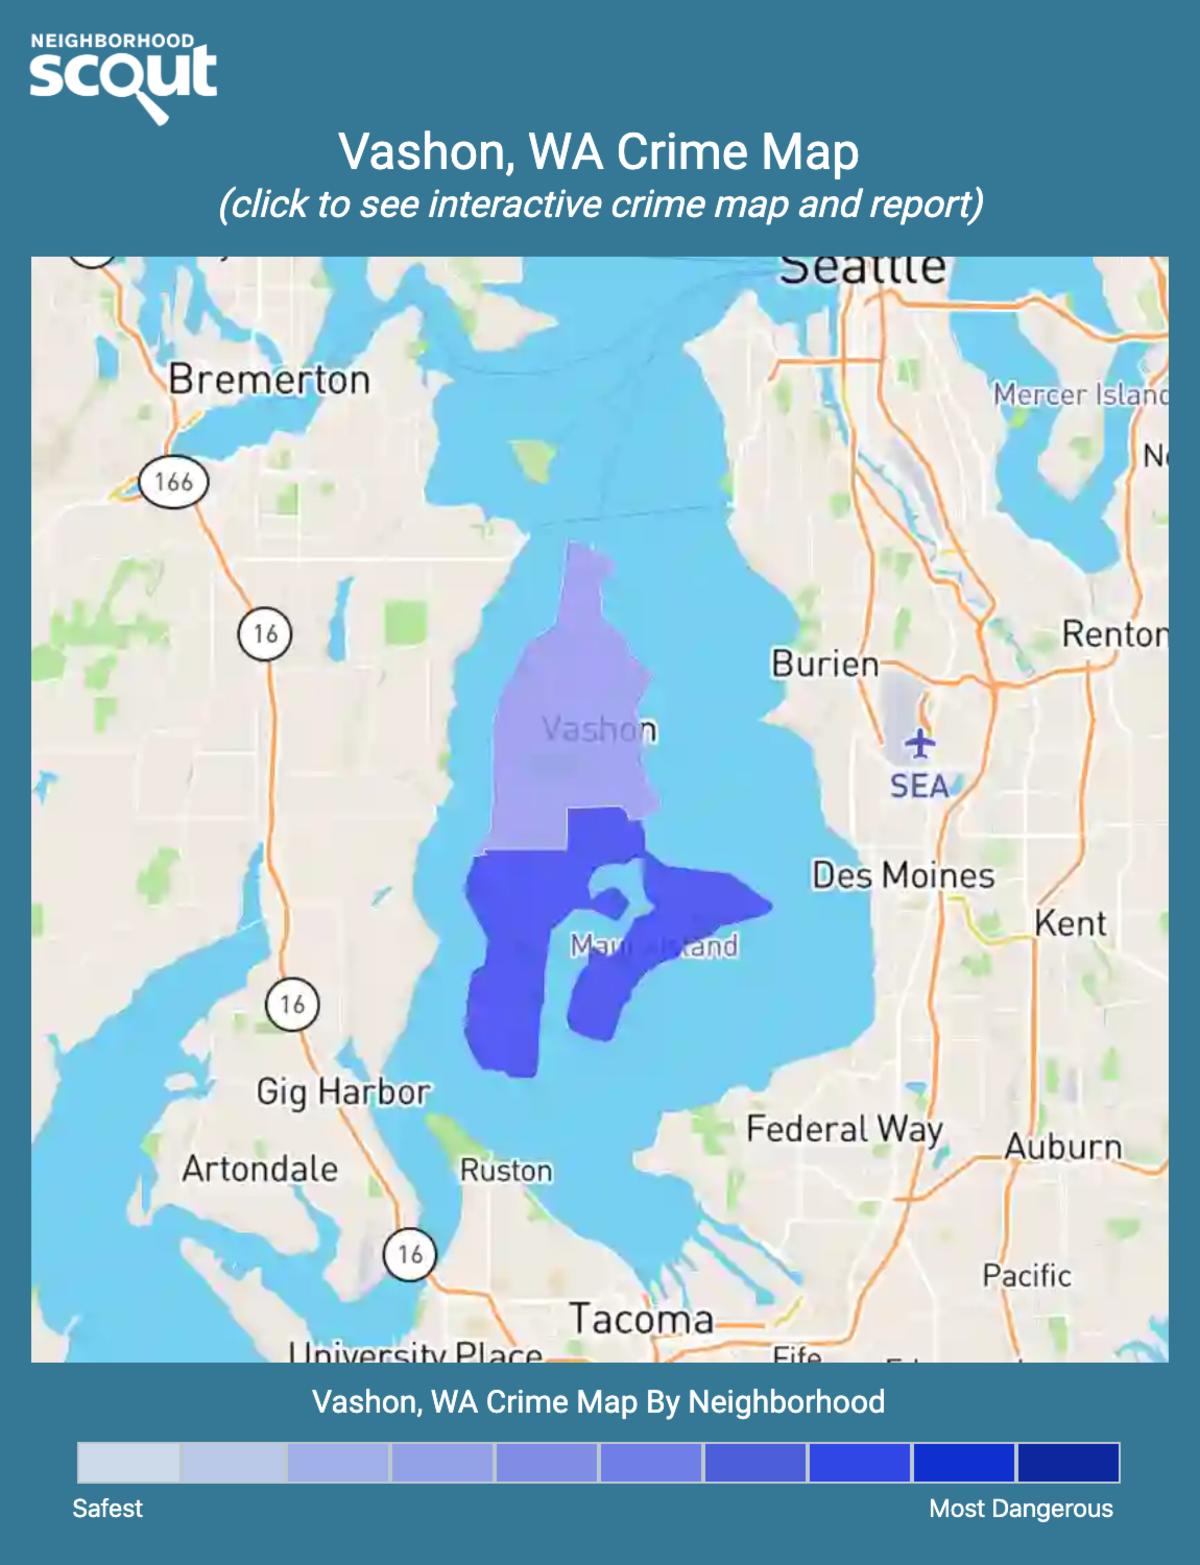 Vashon, Washington crime map